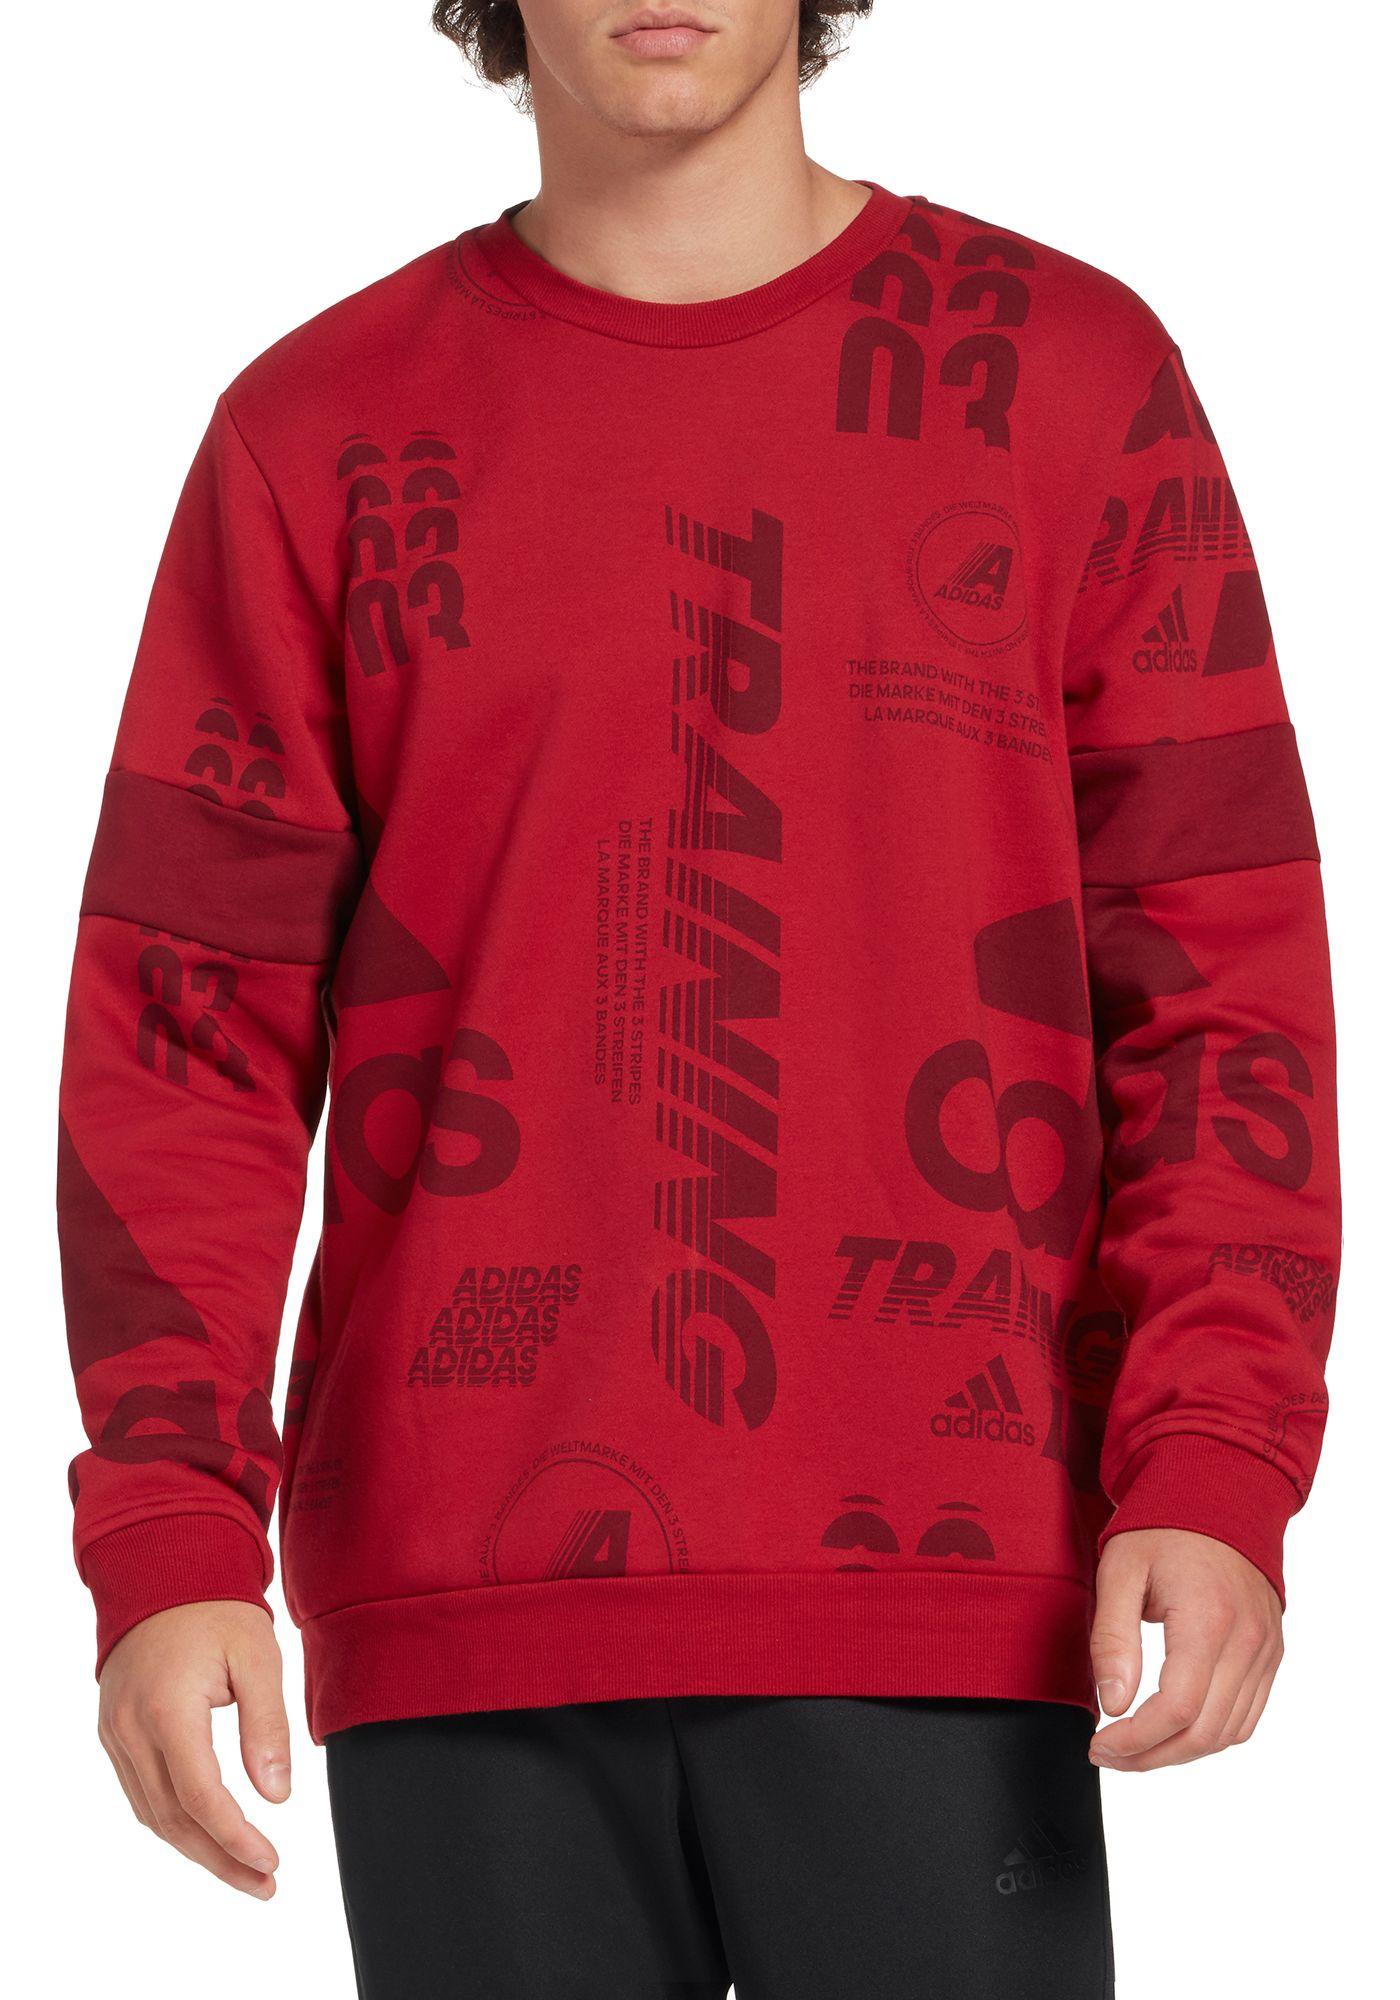 adidas Men's Post Game Allover Print Crewneck Sweatshirt